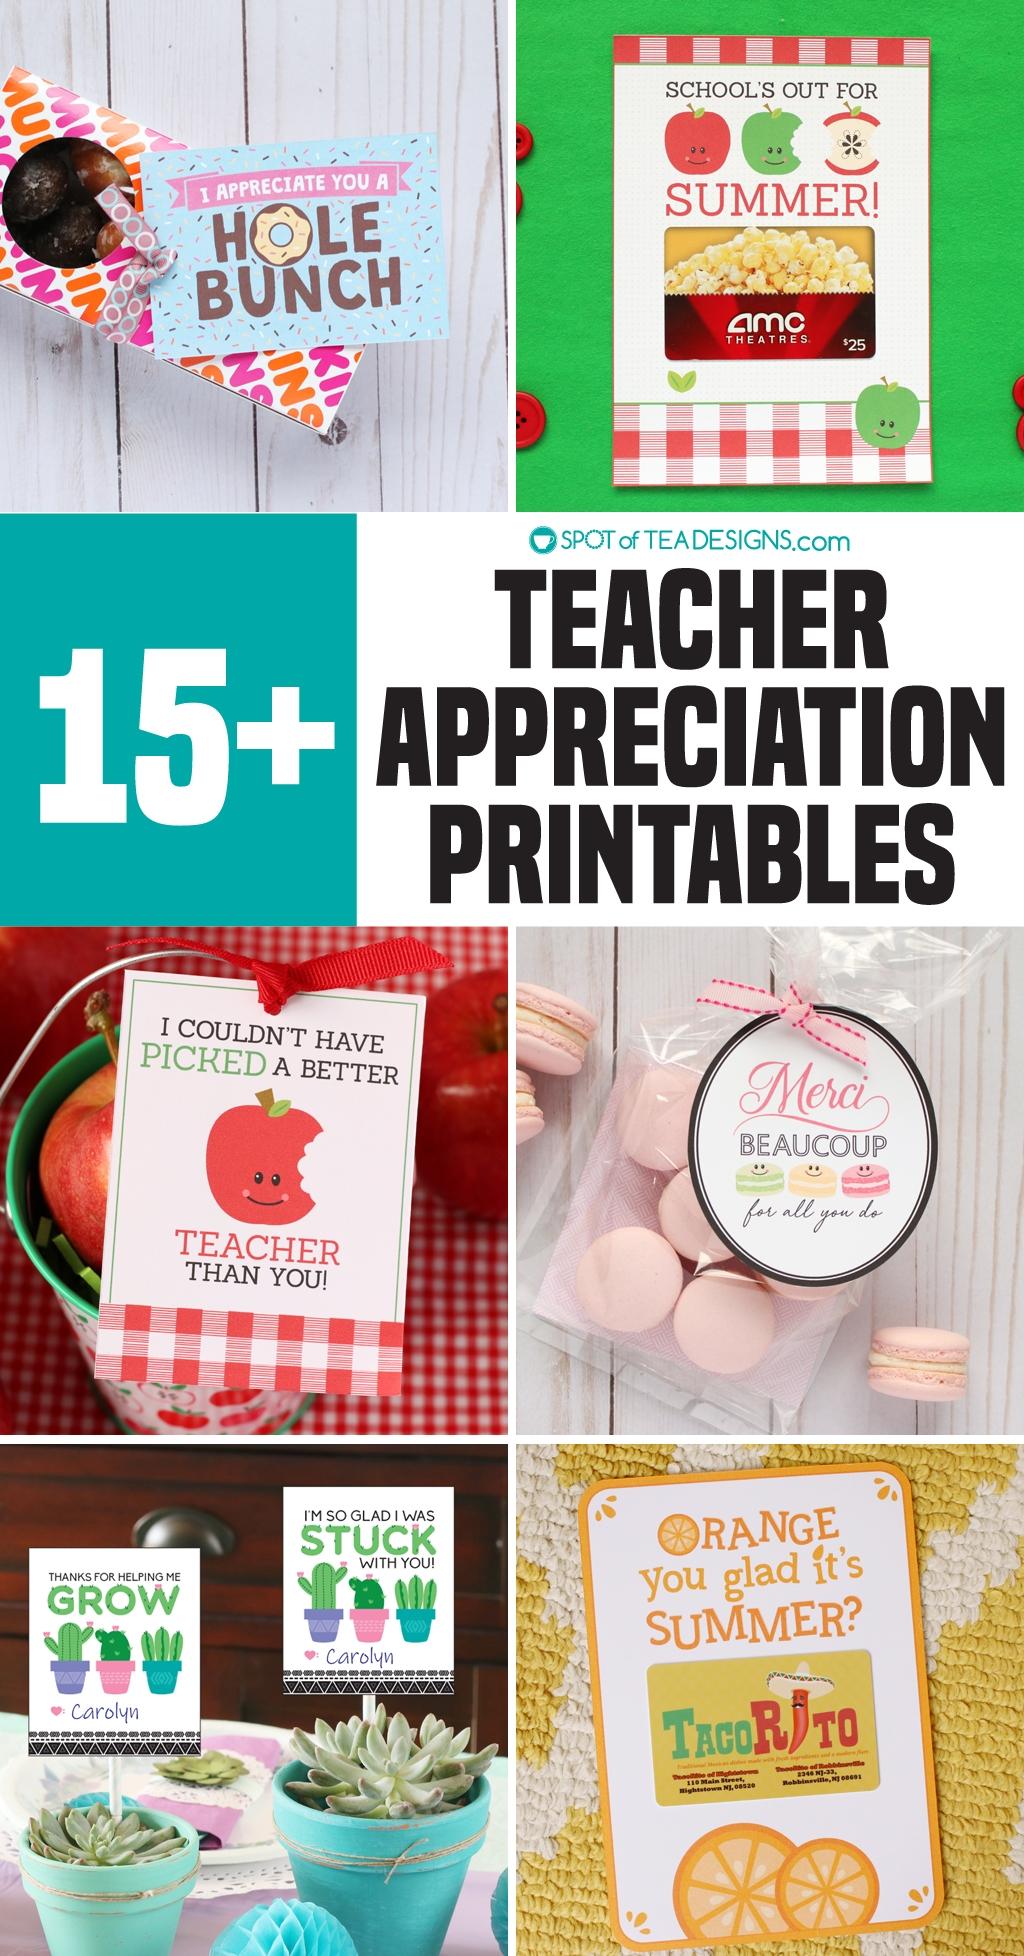 15+ Teacher appreciation printables - great for teacher's appreciation week, Christmas break or the end of the school year! | spotofteadesigns.com